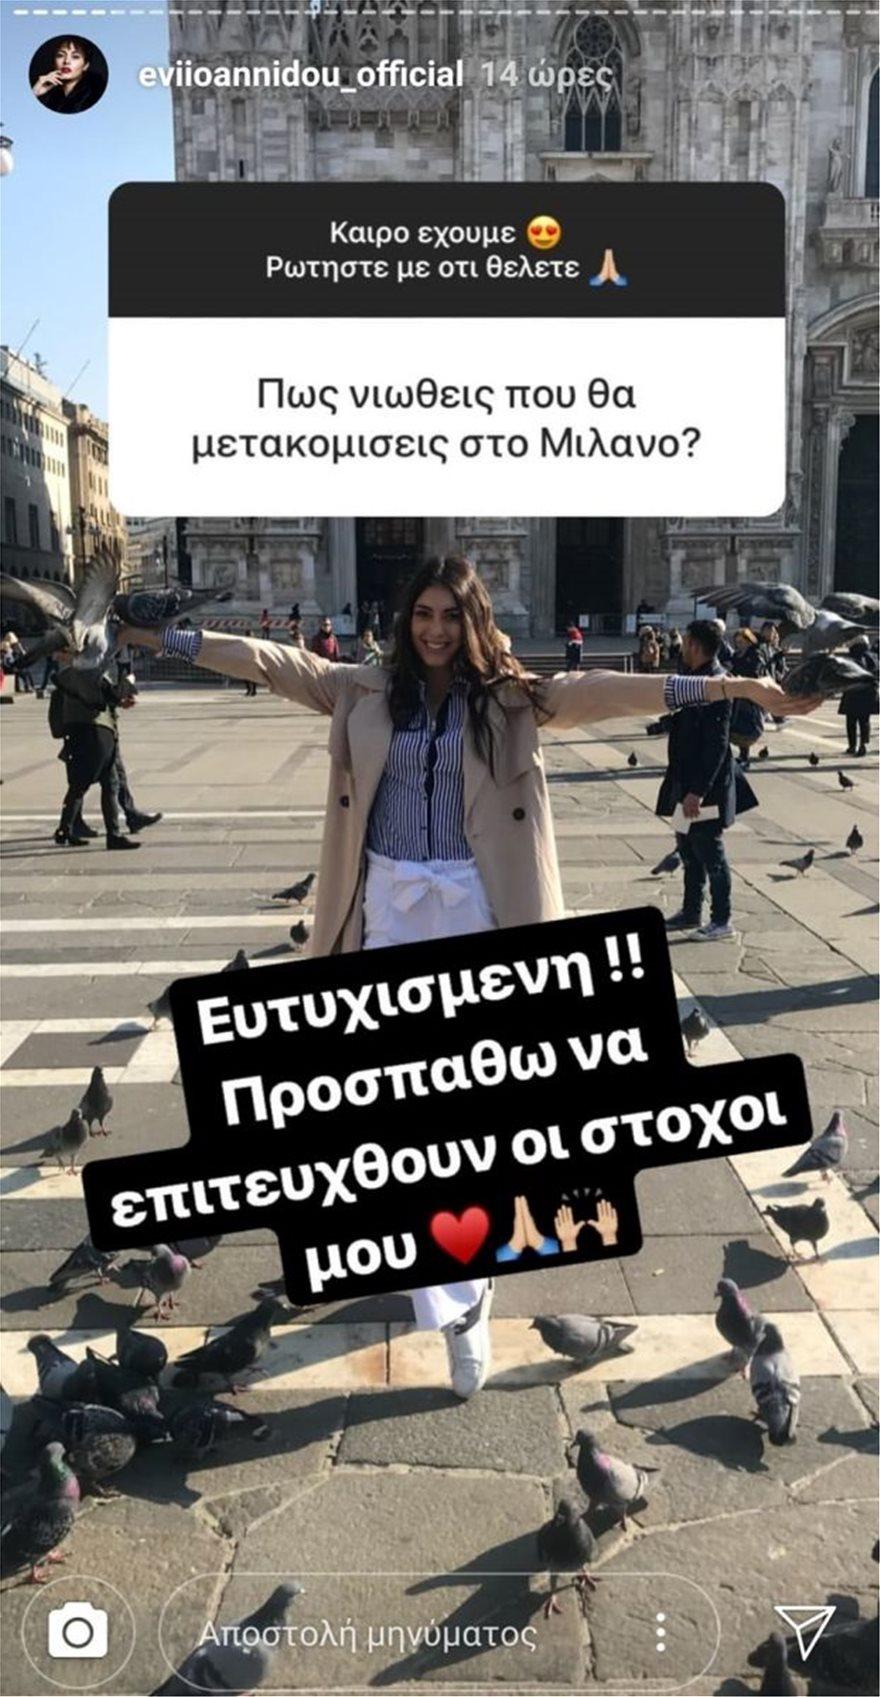 Evi_Ioannidou